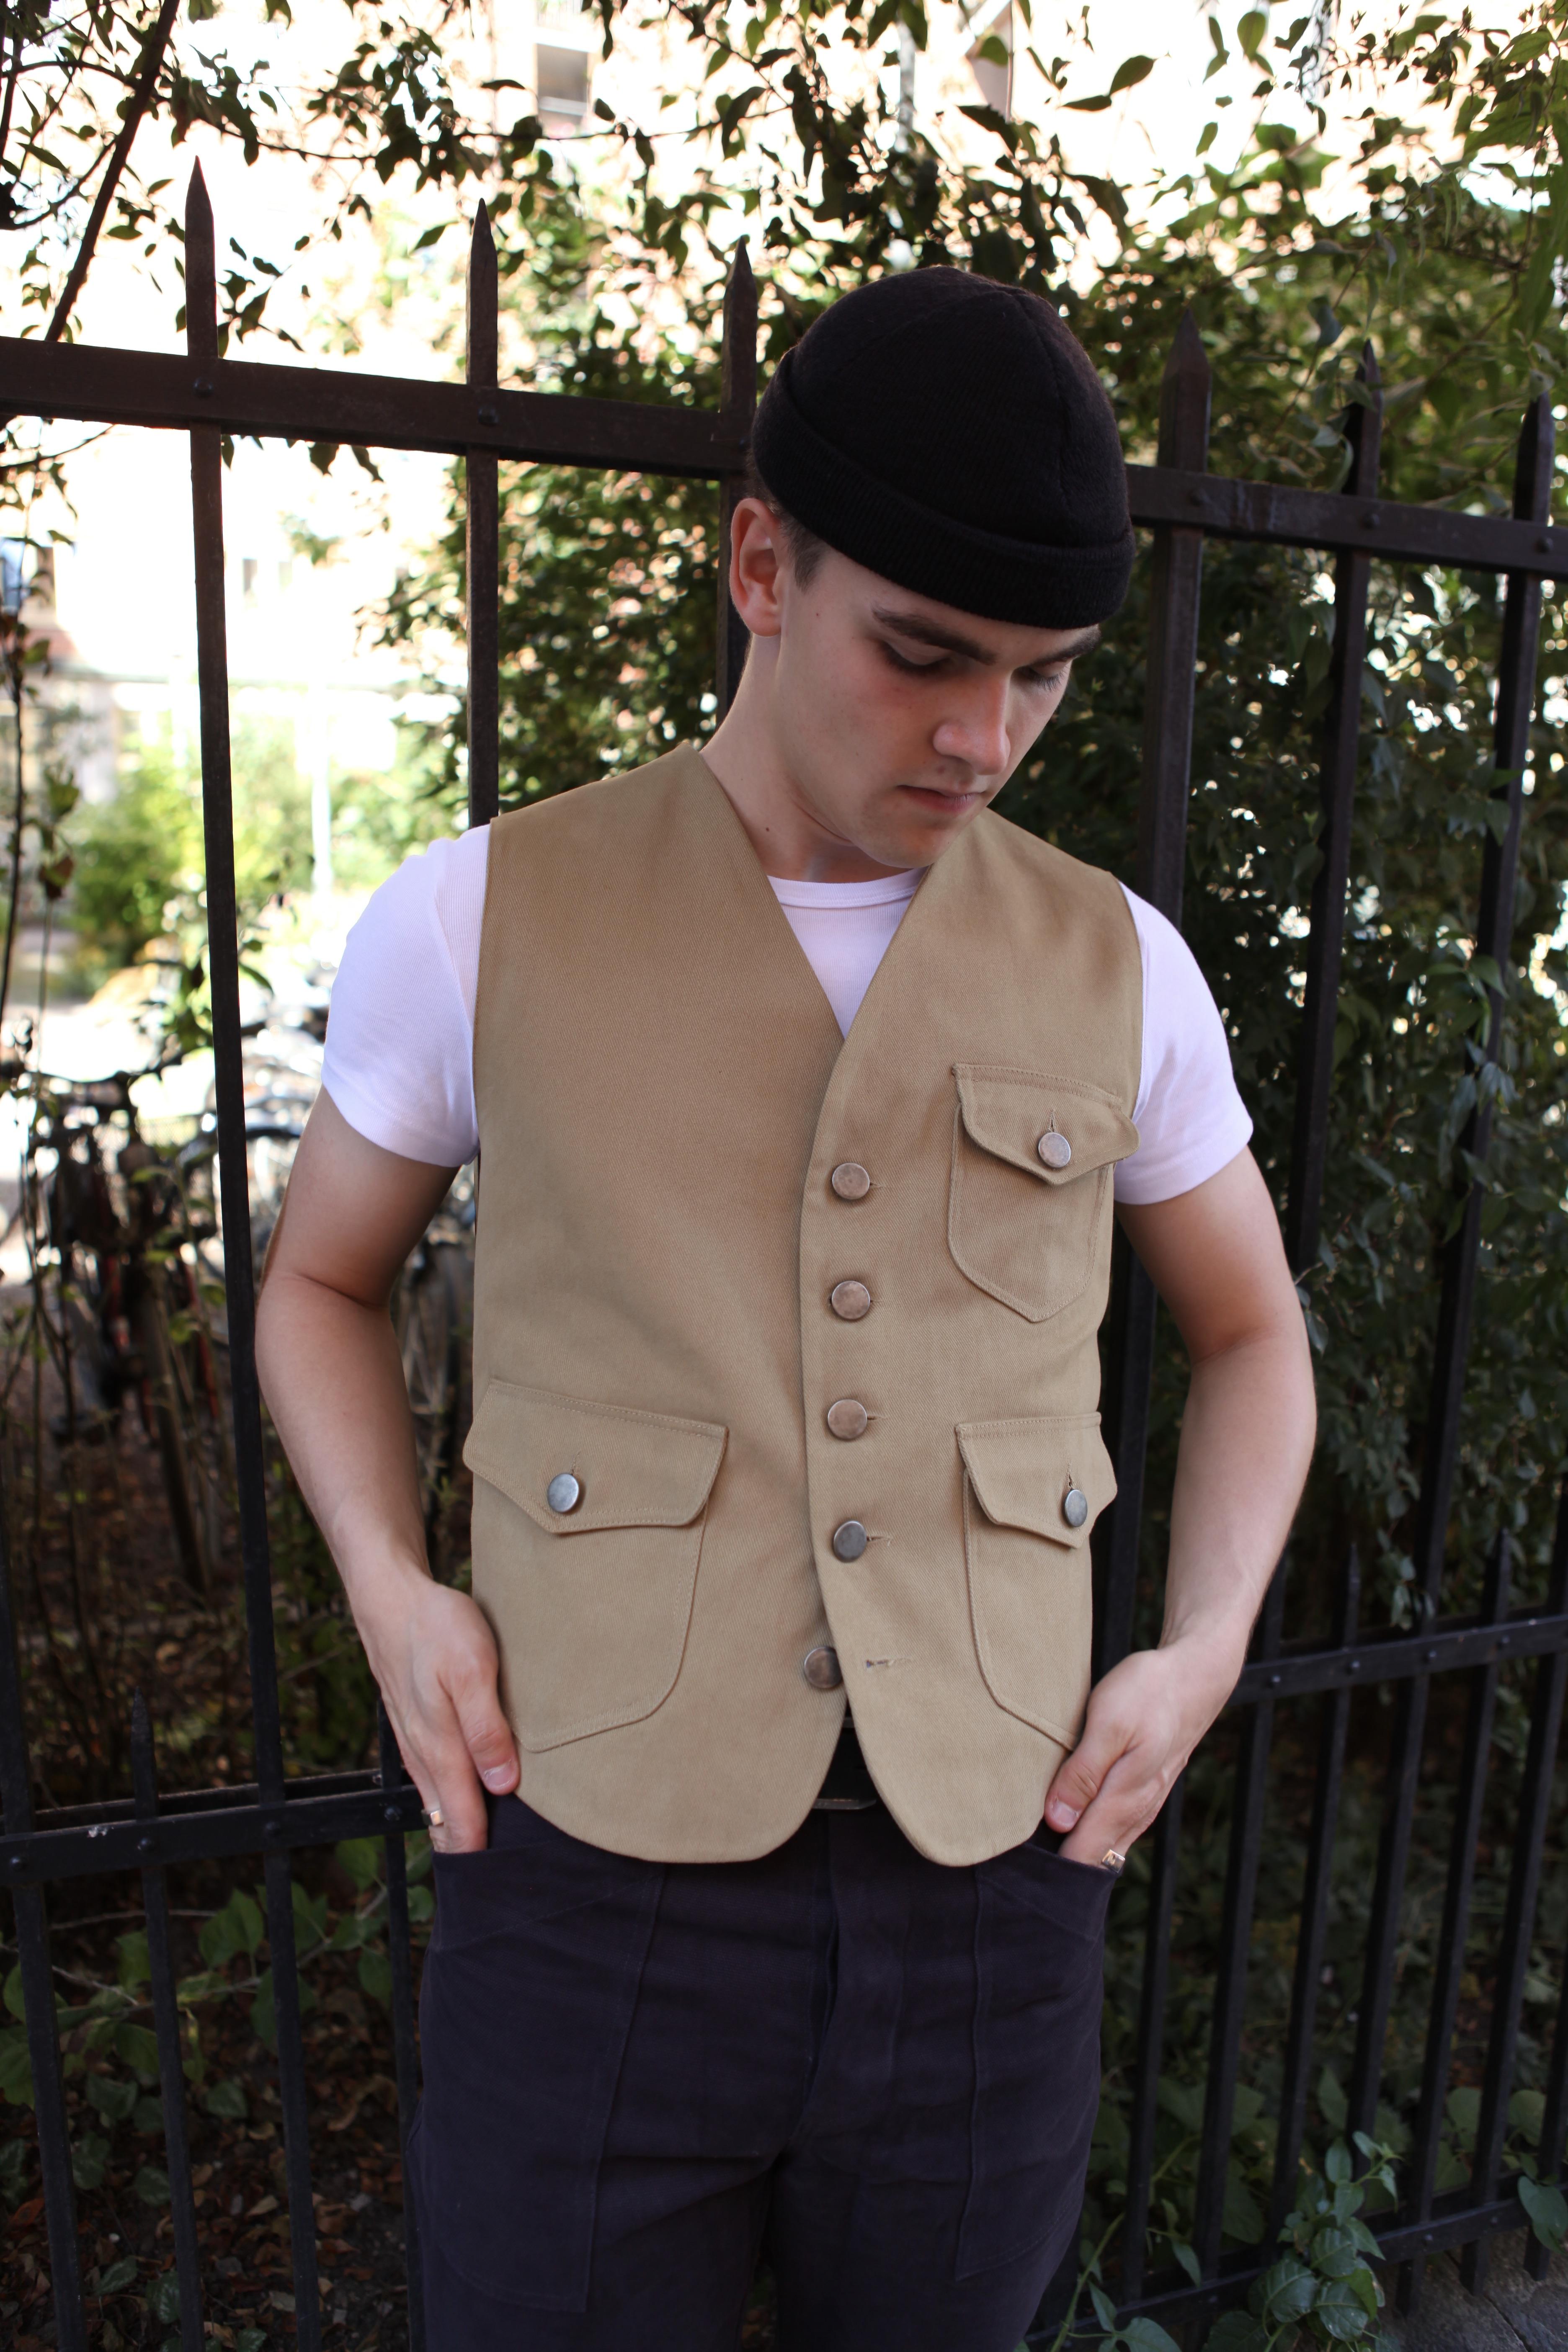 Kaki Canvas-Denim vest from Tonton et fils